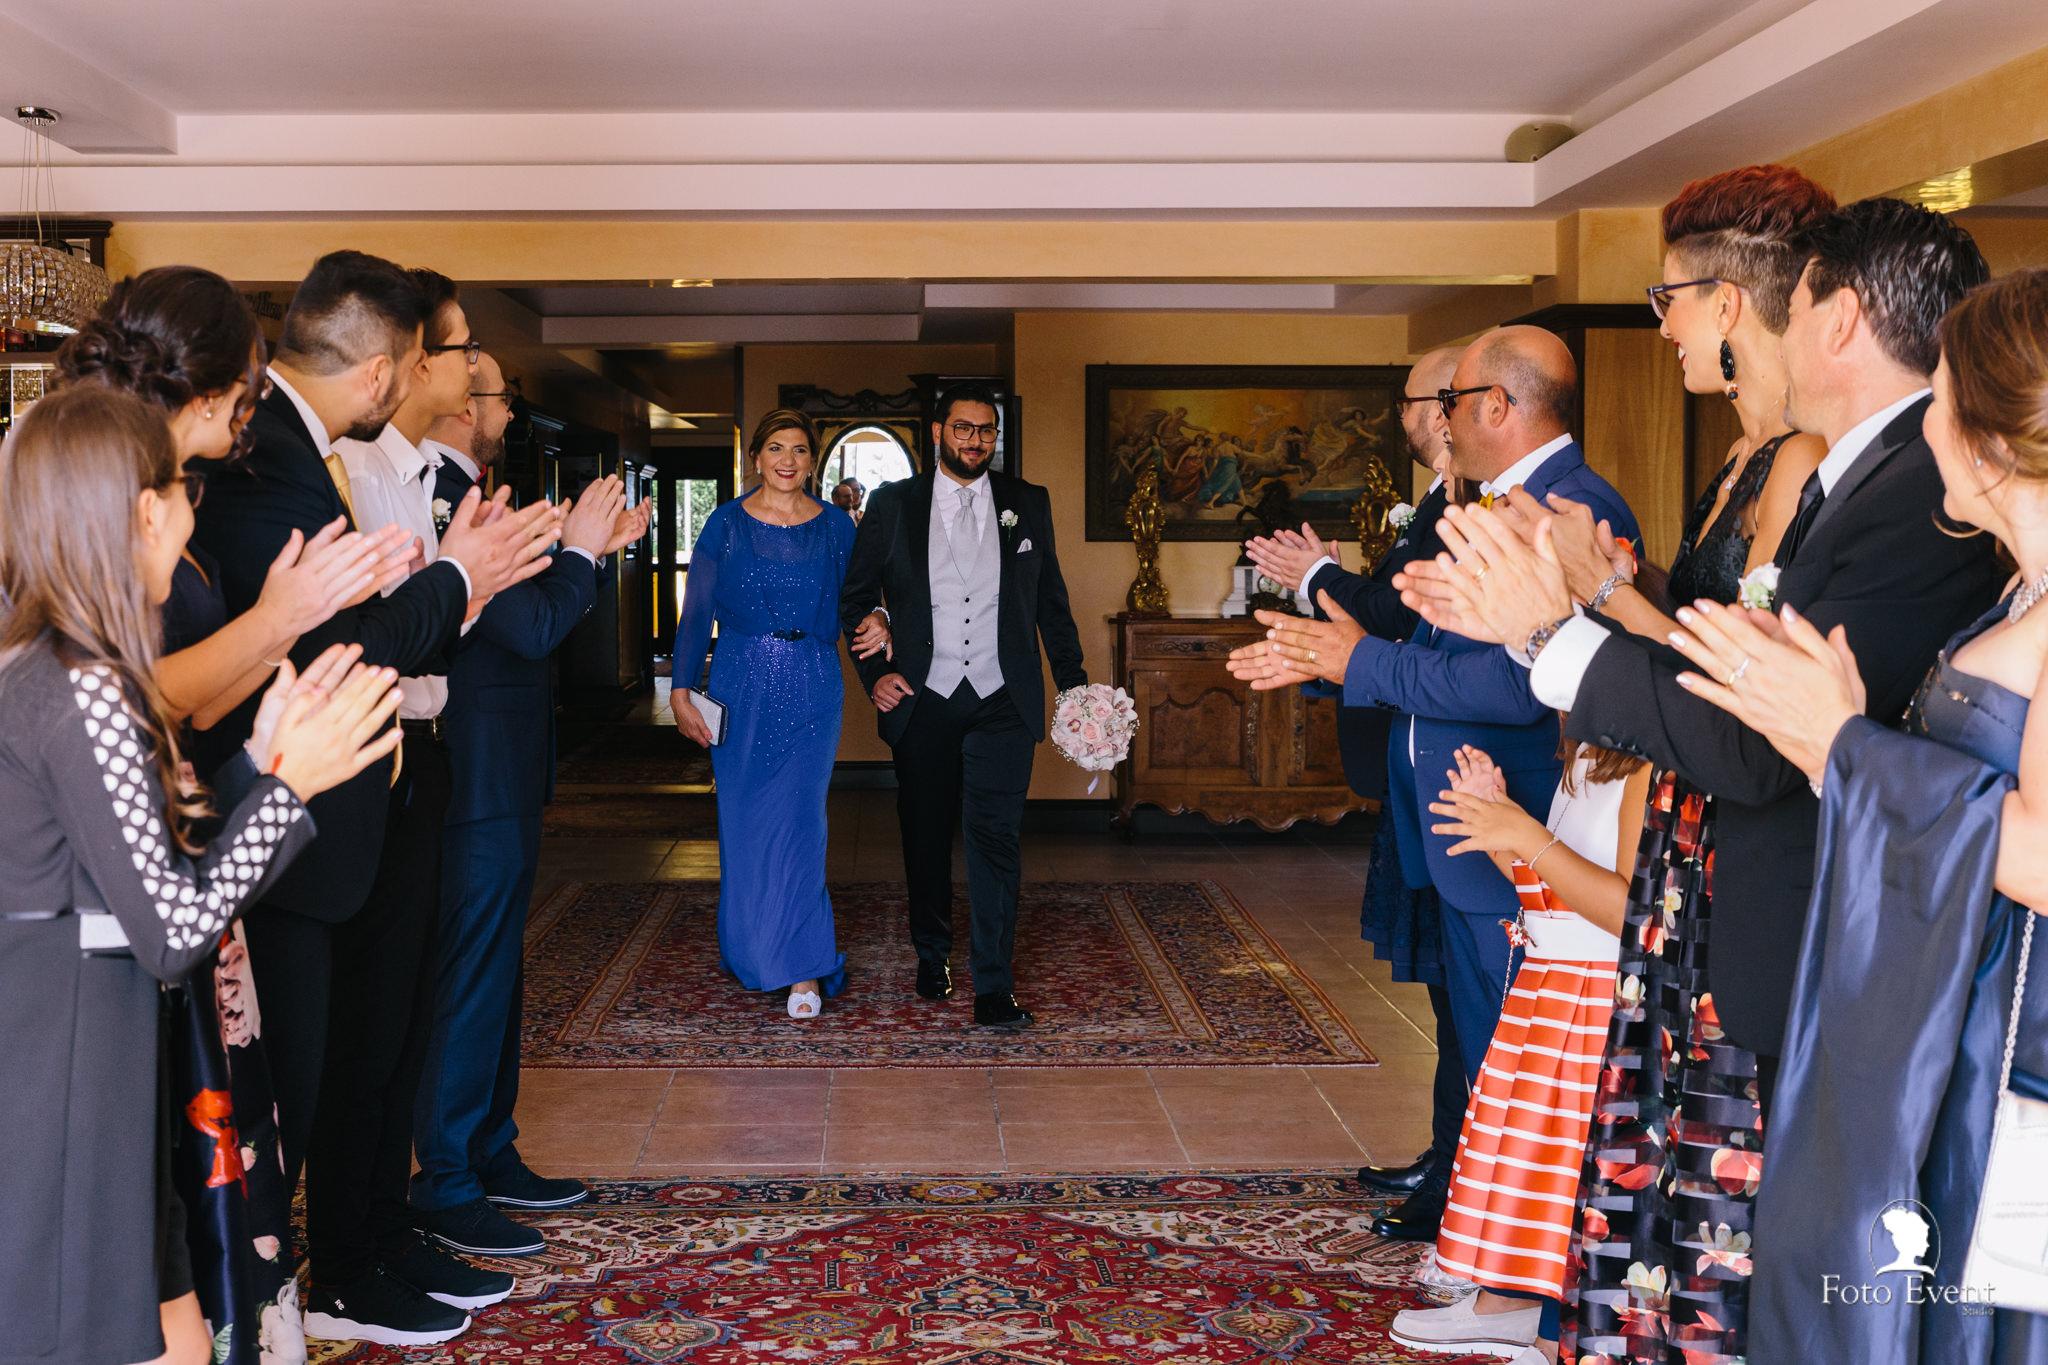 006-2019-09-09-Matrimonio-Dorotea-e-Alberto-Iemmolo-5DN-253